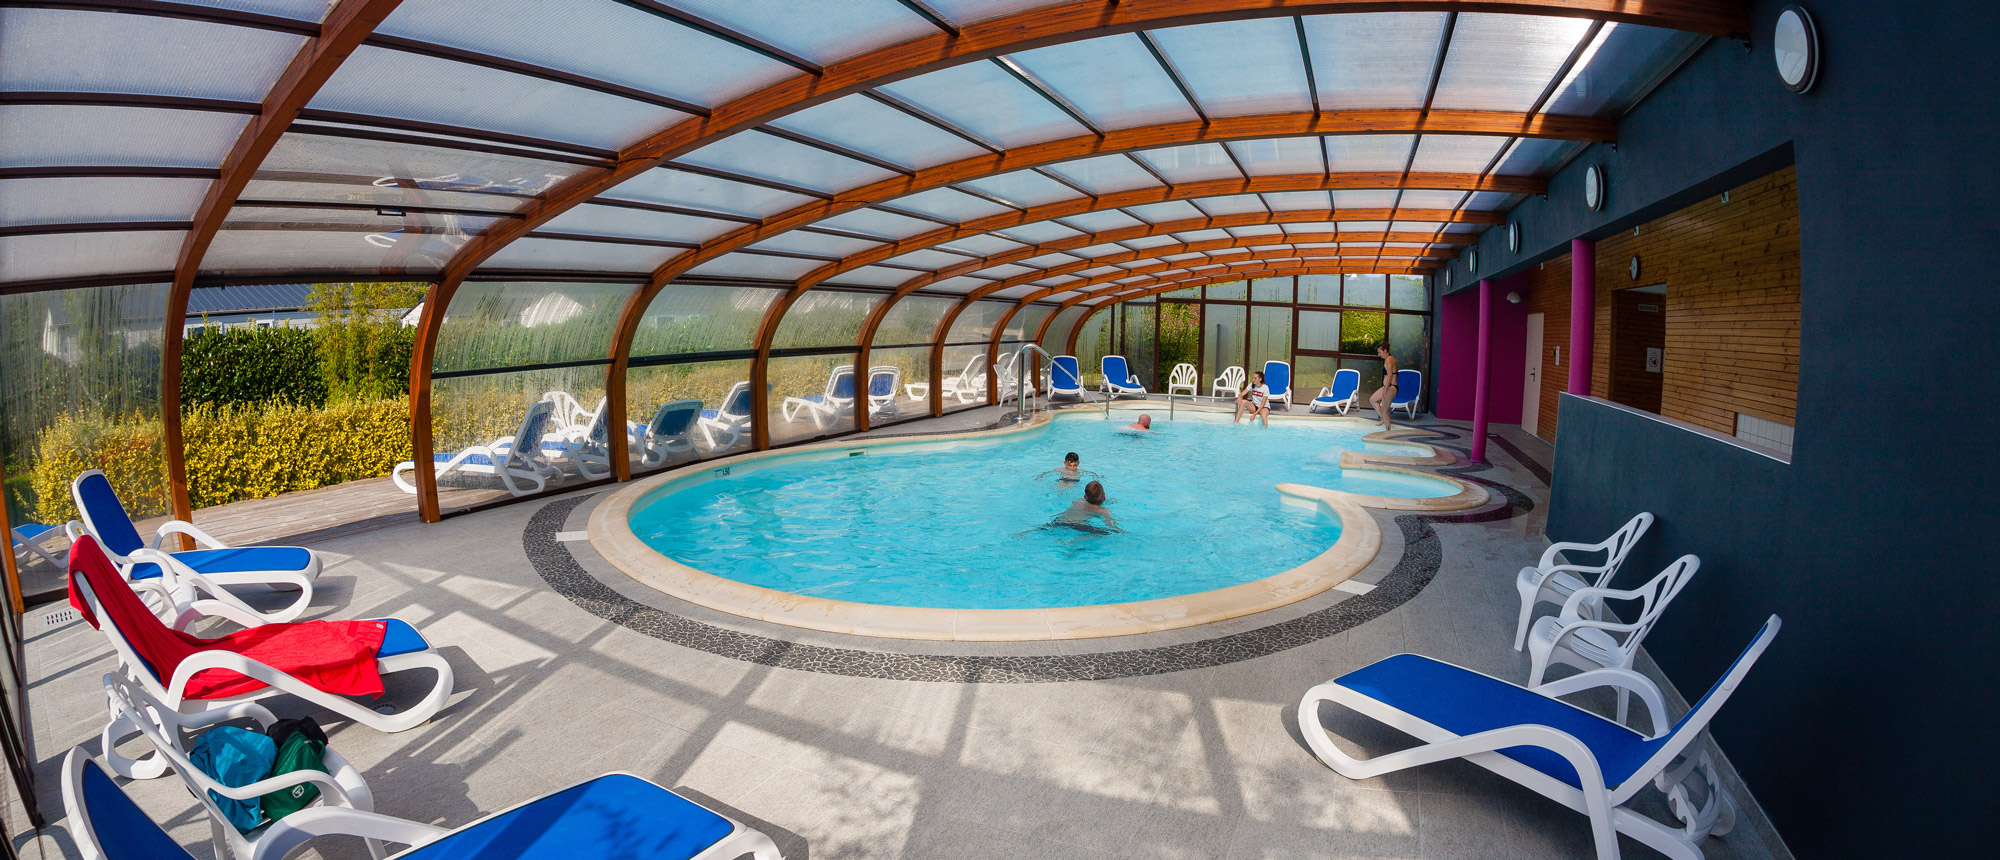 Camping Ar Kleguer avec piscine couverte